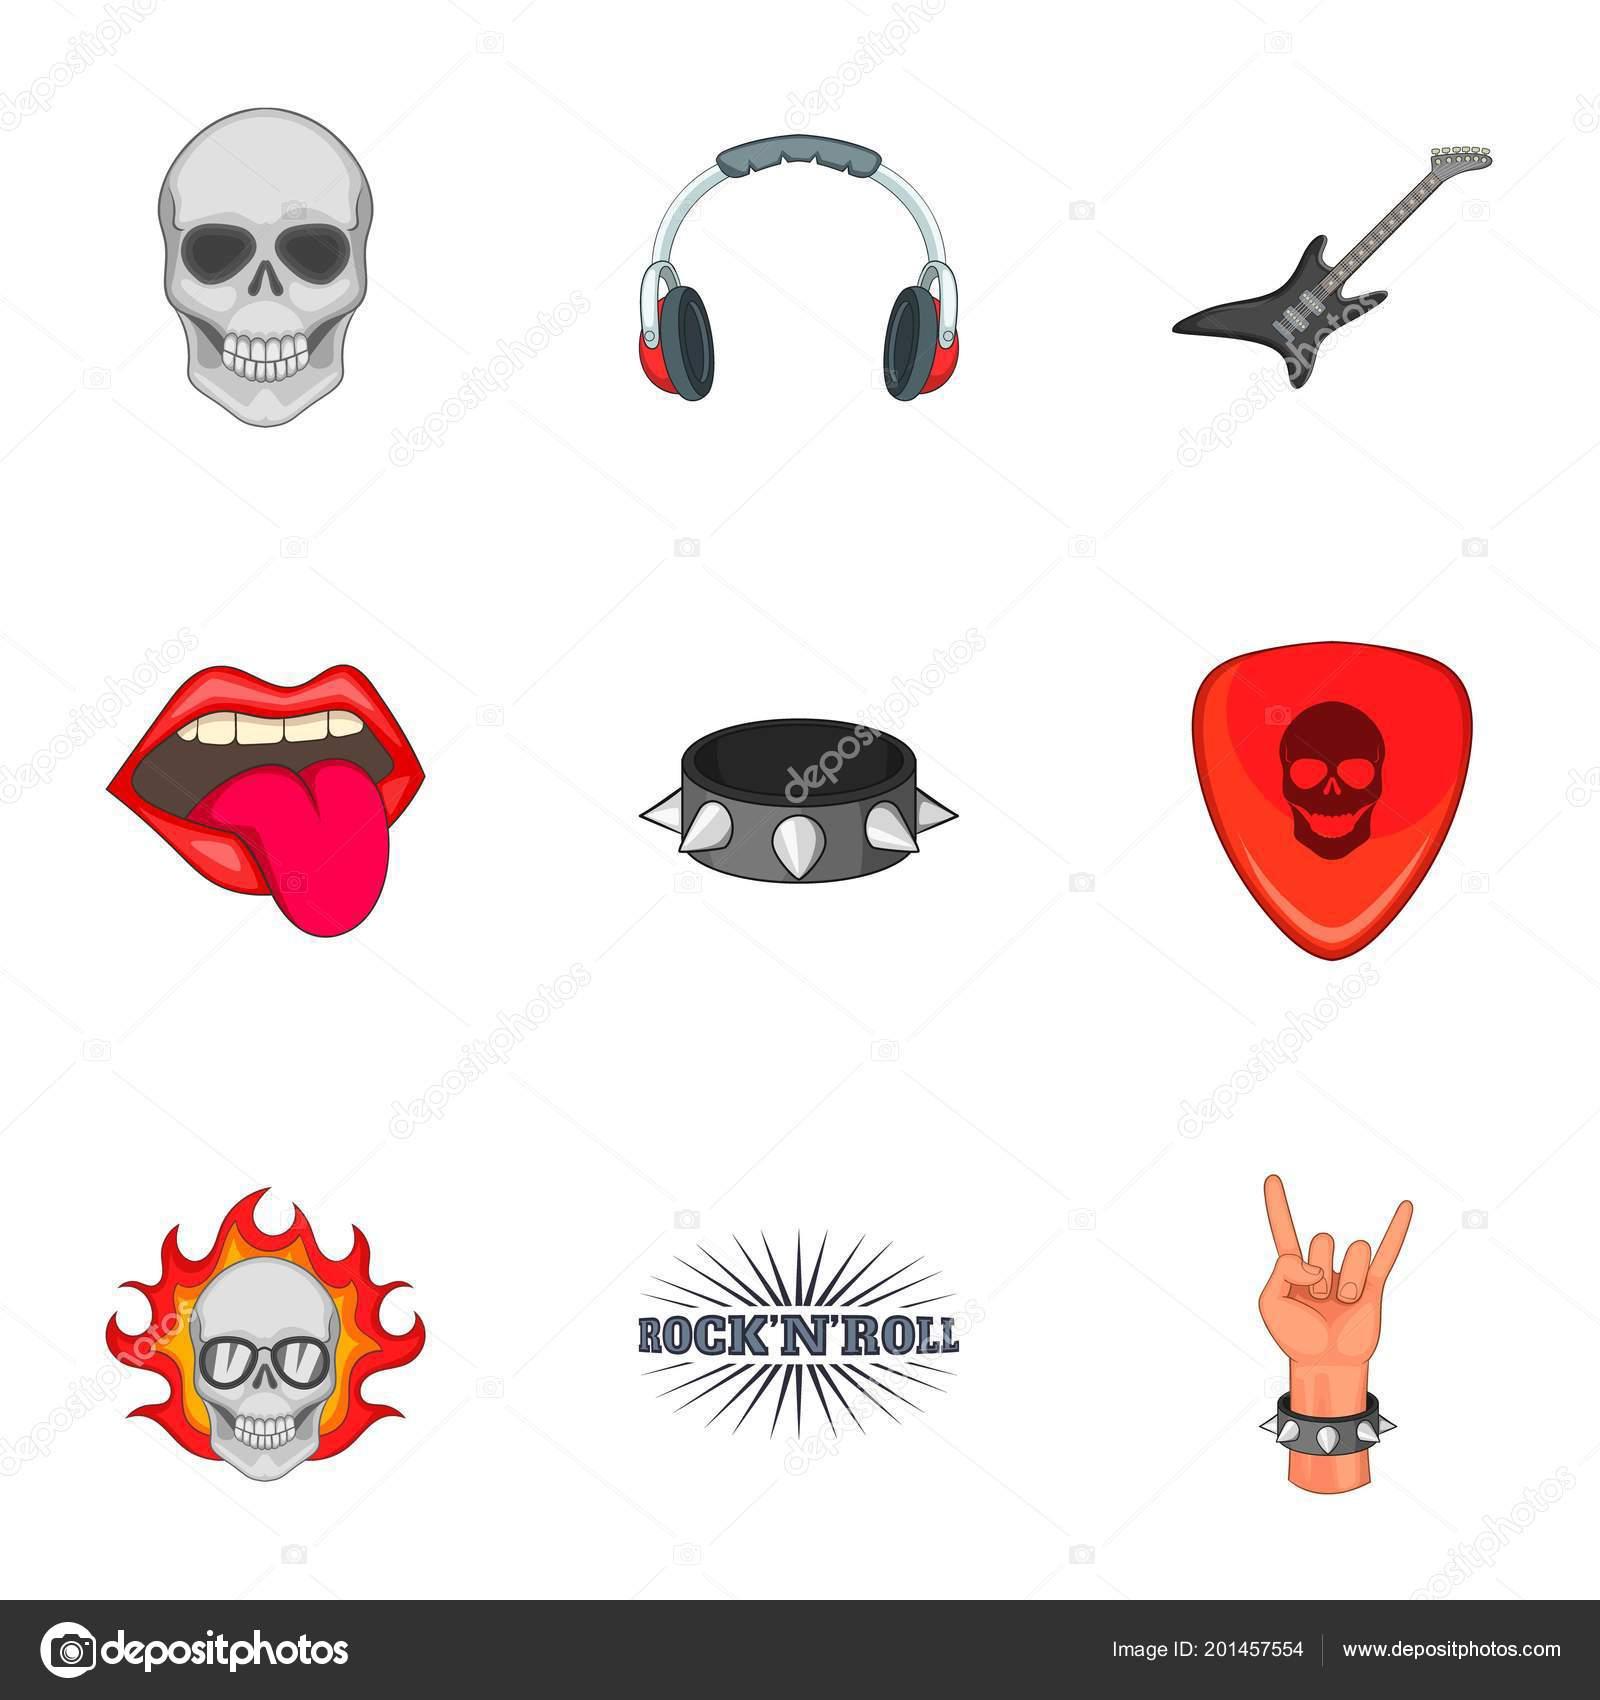 Rock N Roll Etiqueta Iconos Conjunto Estilo De Dibujos